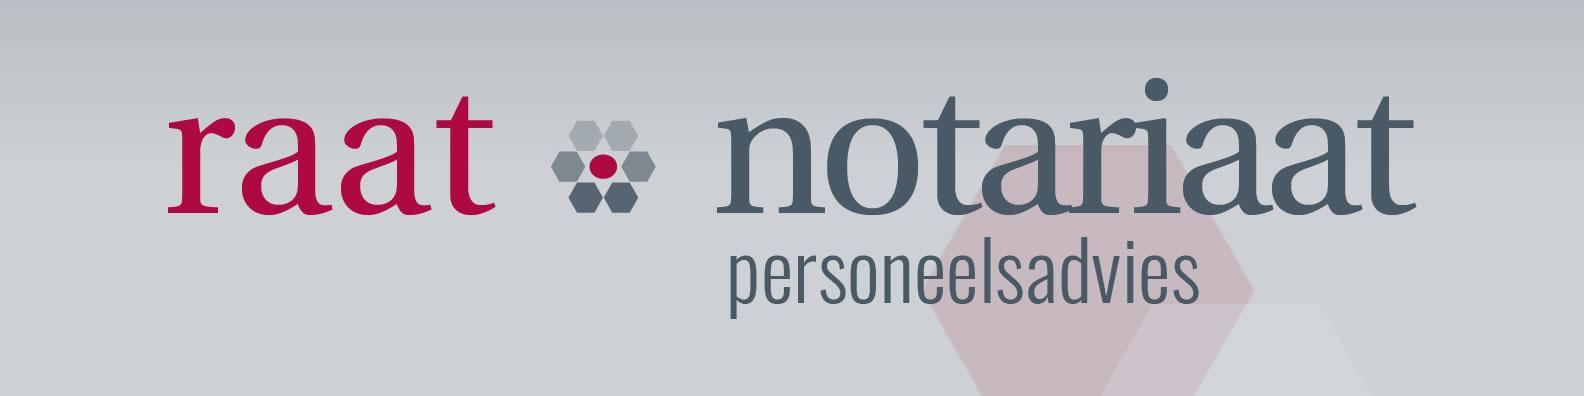 Kandidaat- notaris OG en Kandidaat-notaris OR